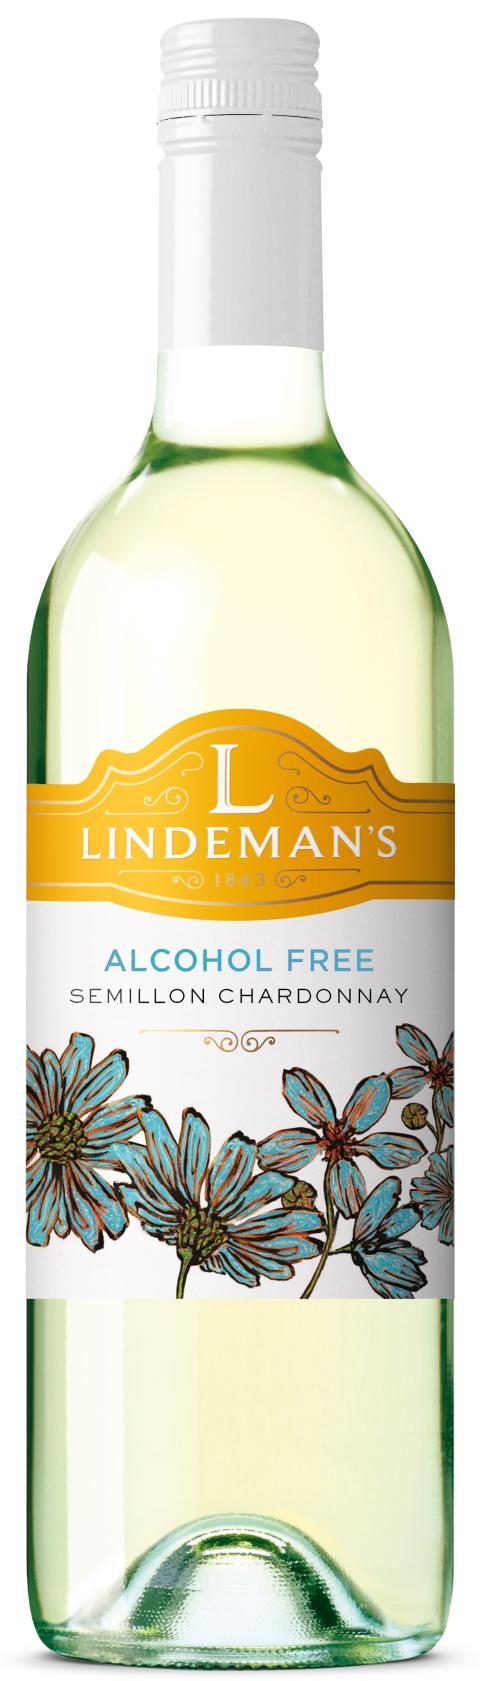 Lindeman's Alcohol Free Sem Chard